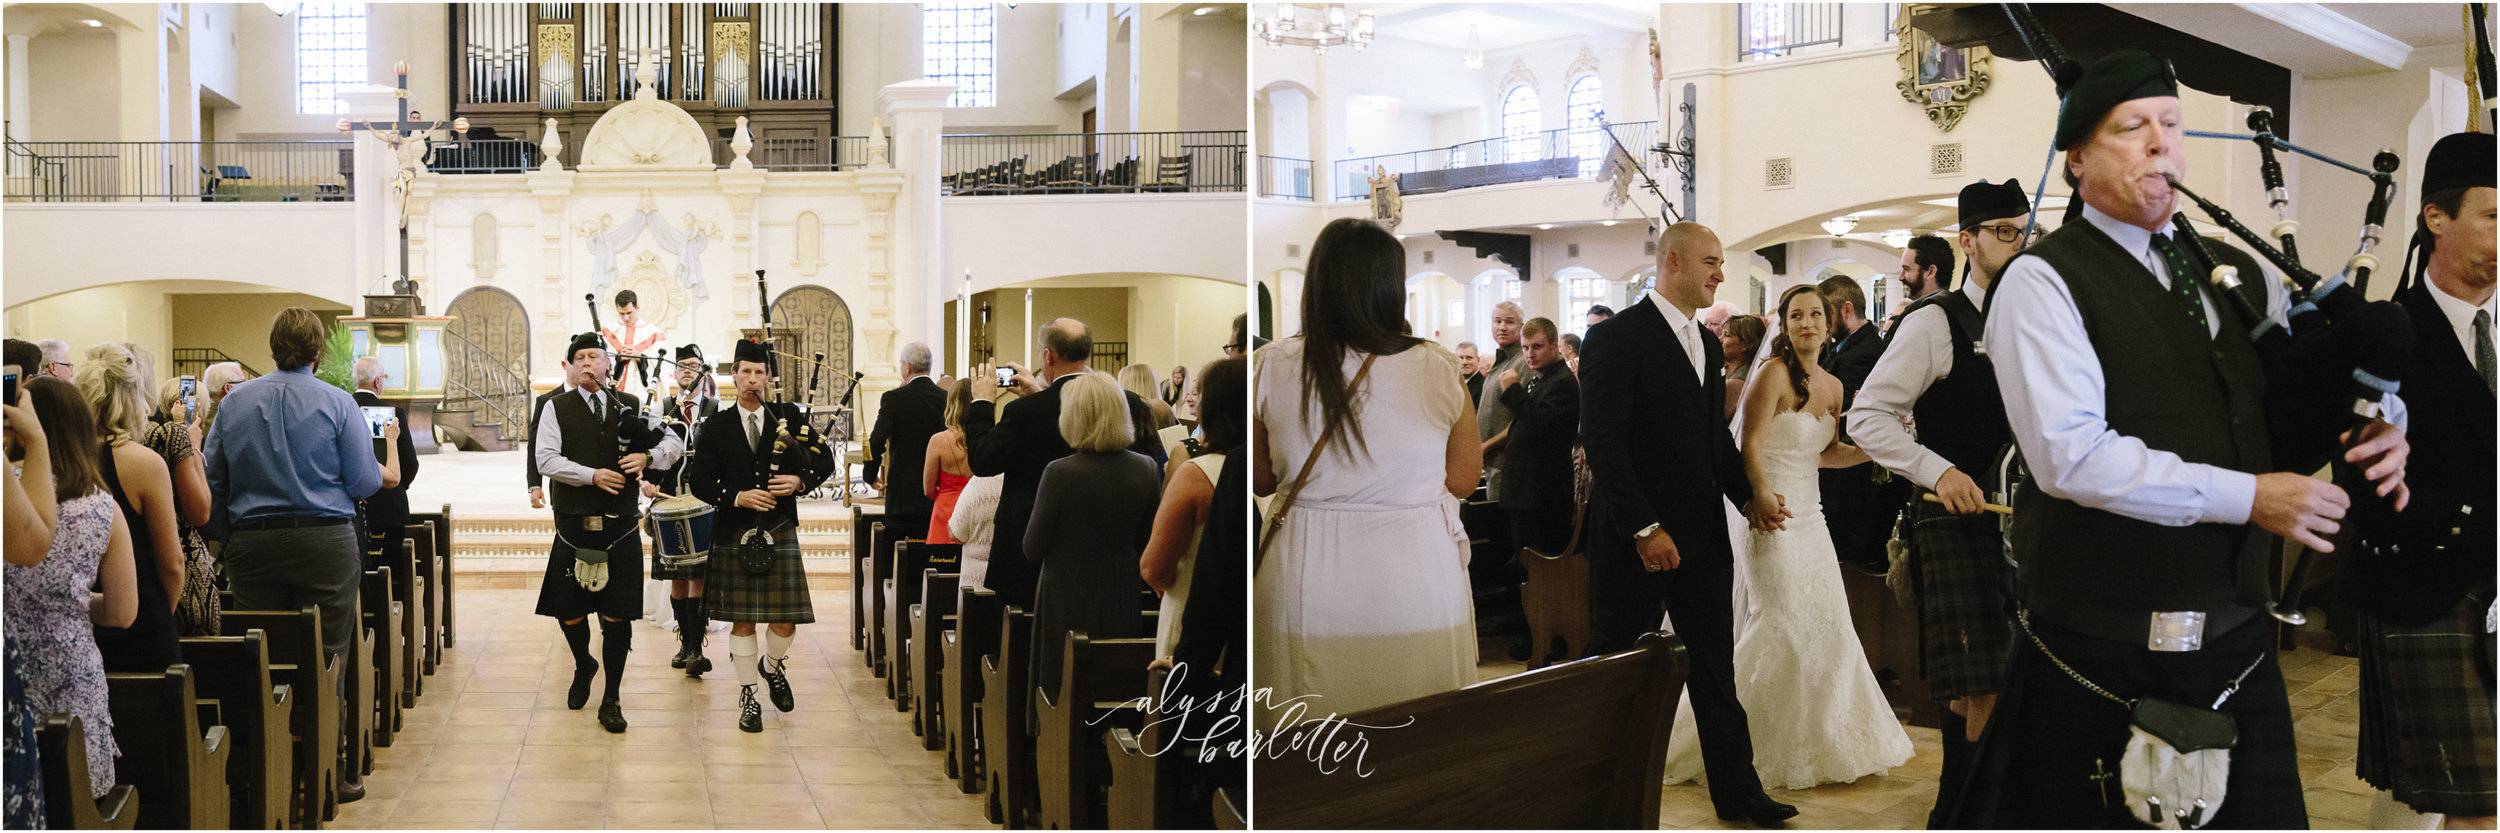 kansas city wedding photography catholic church visitation ceremony bagpipes recessional